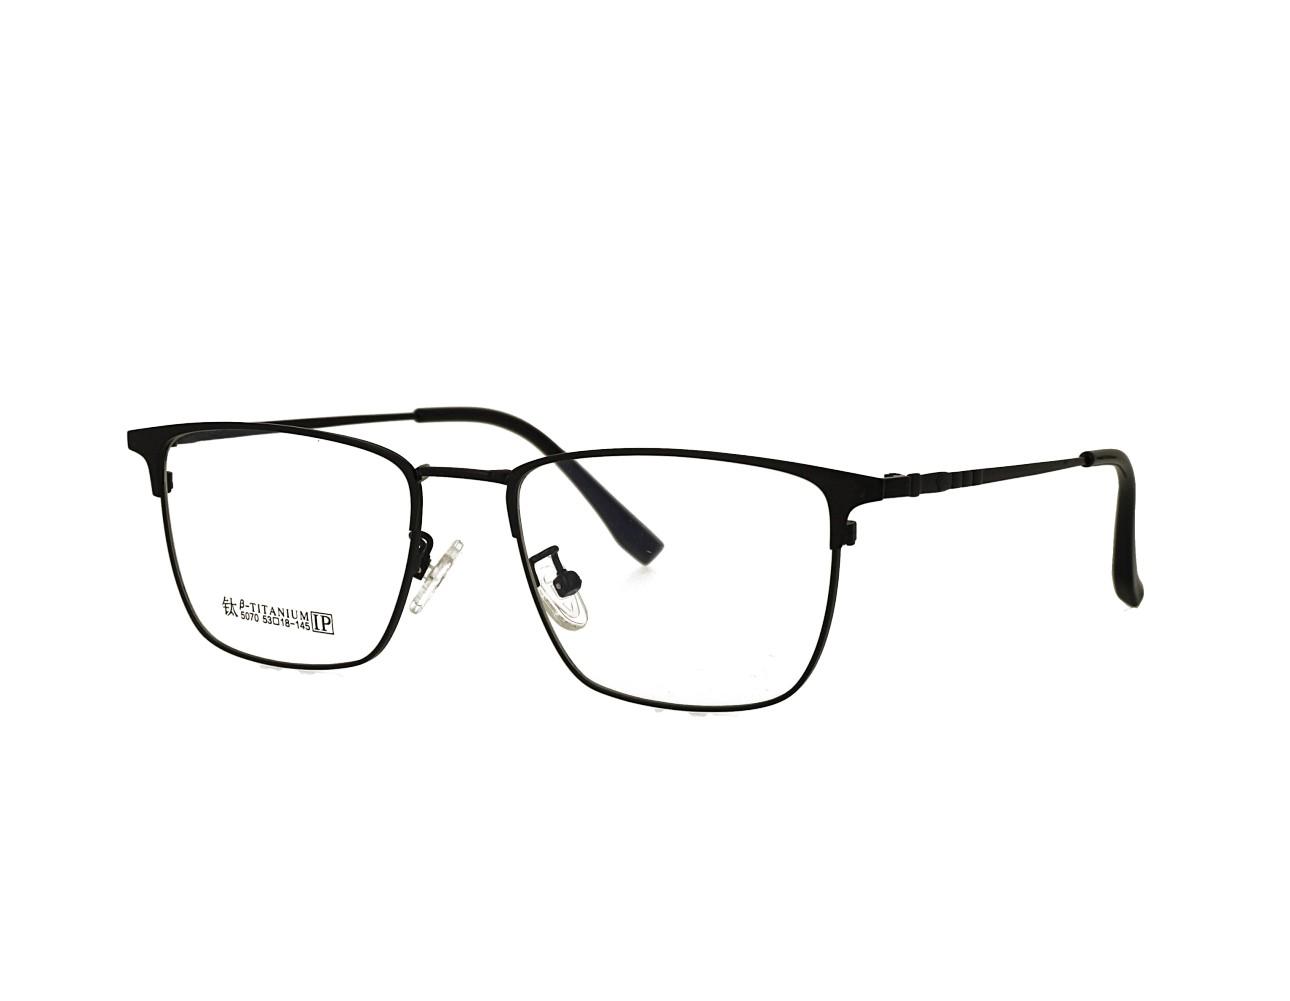 53 size Mans Full Rim Optical frame Stainless Steal Eyeglasses Manufacturer